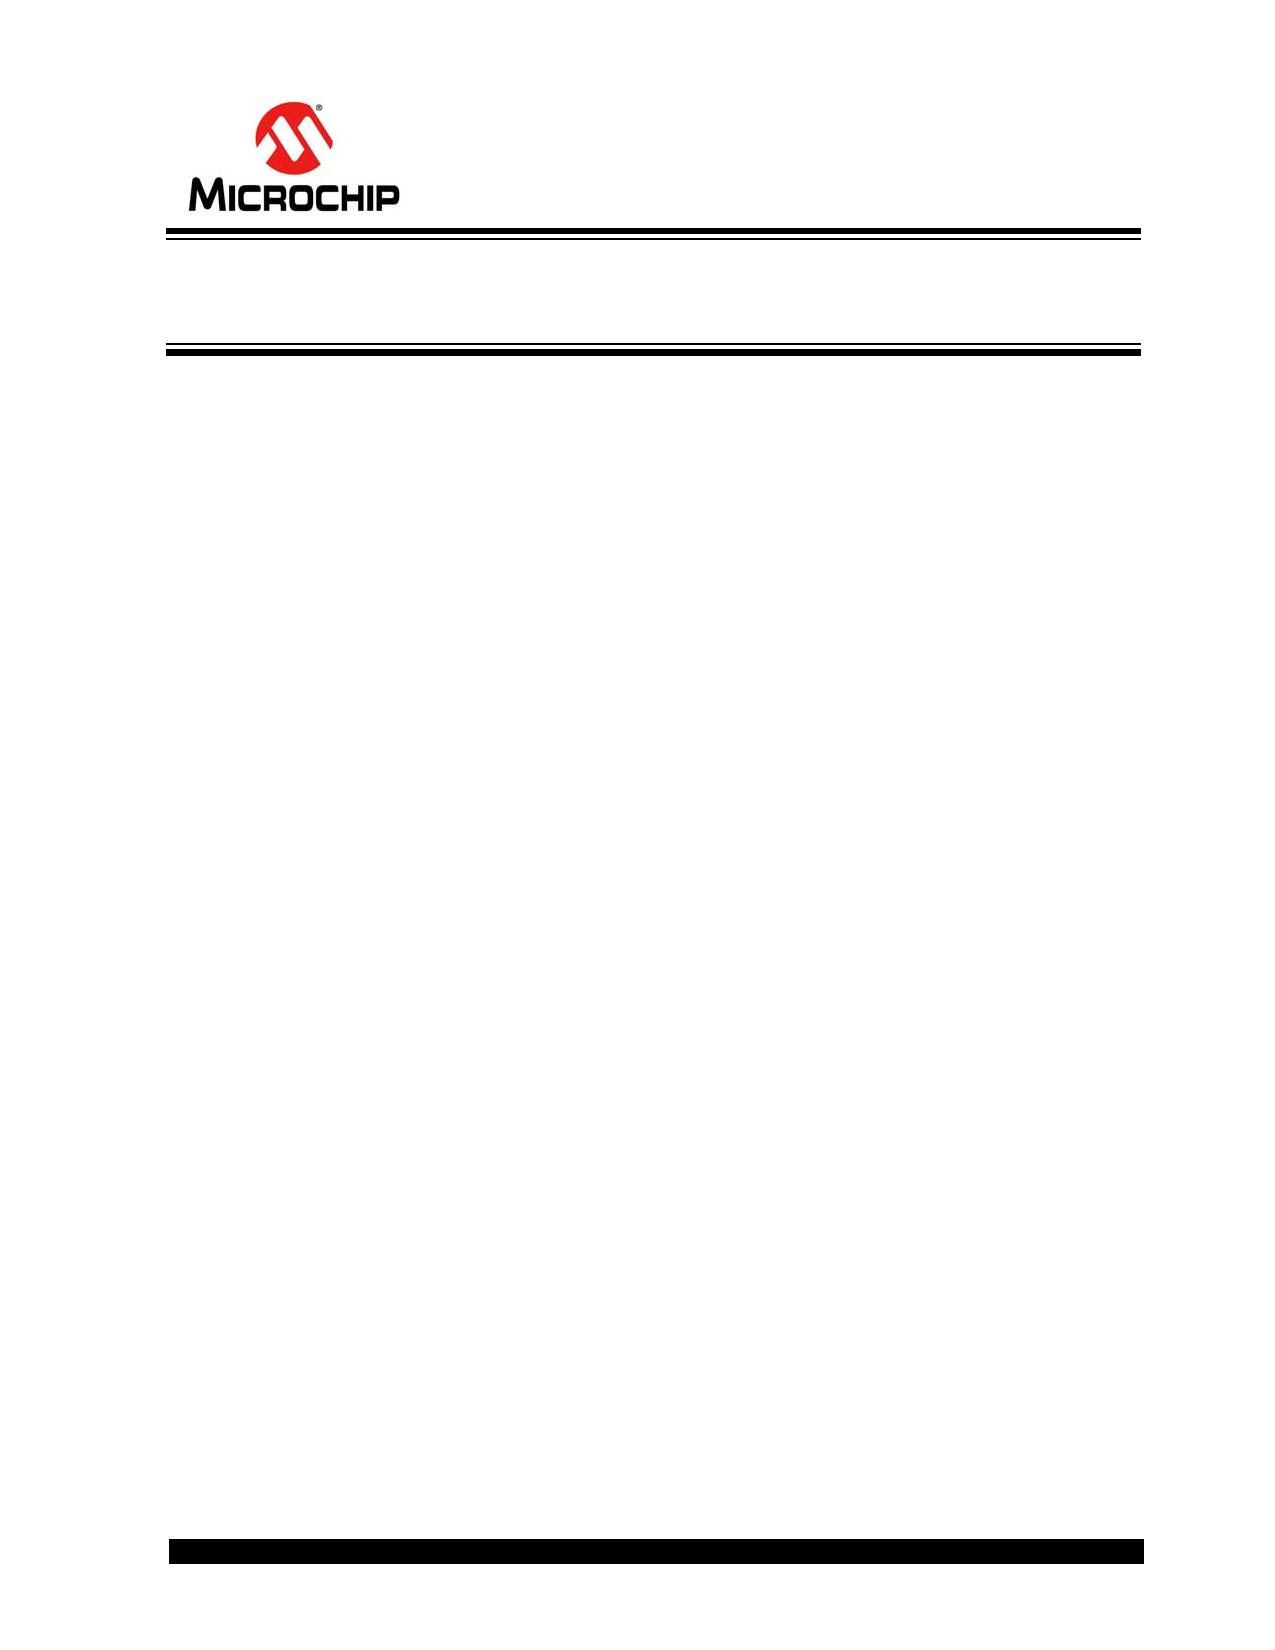 PIC24FV32KA301 데이터시트 및 PIC24FV32KA301 PDF